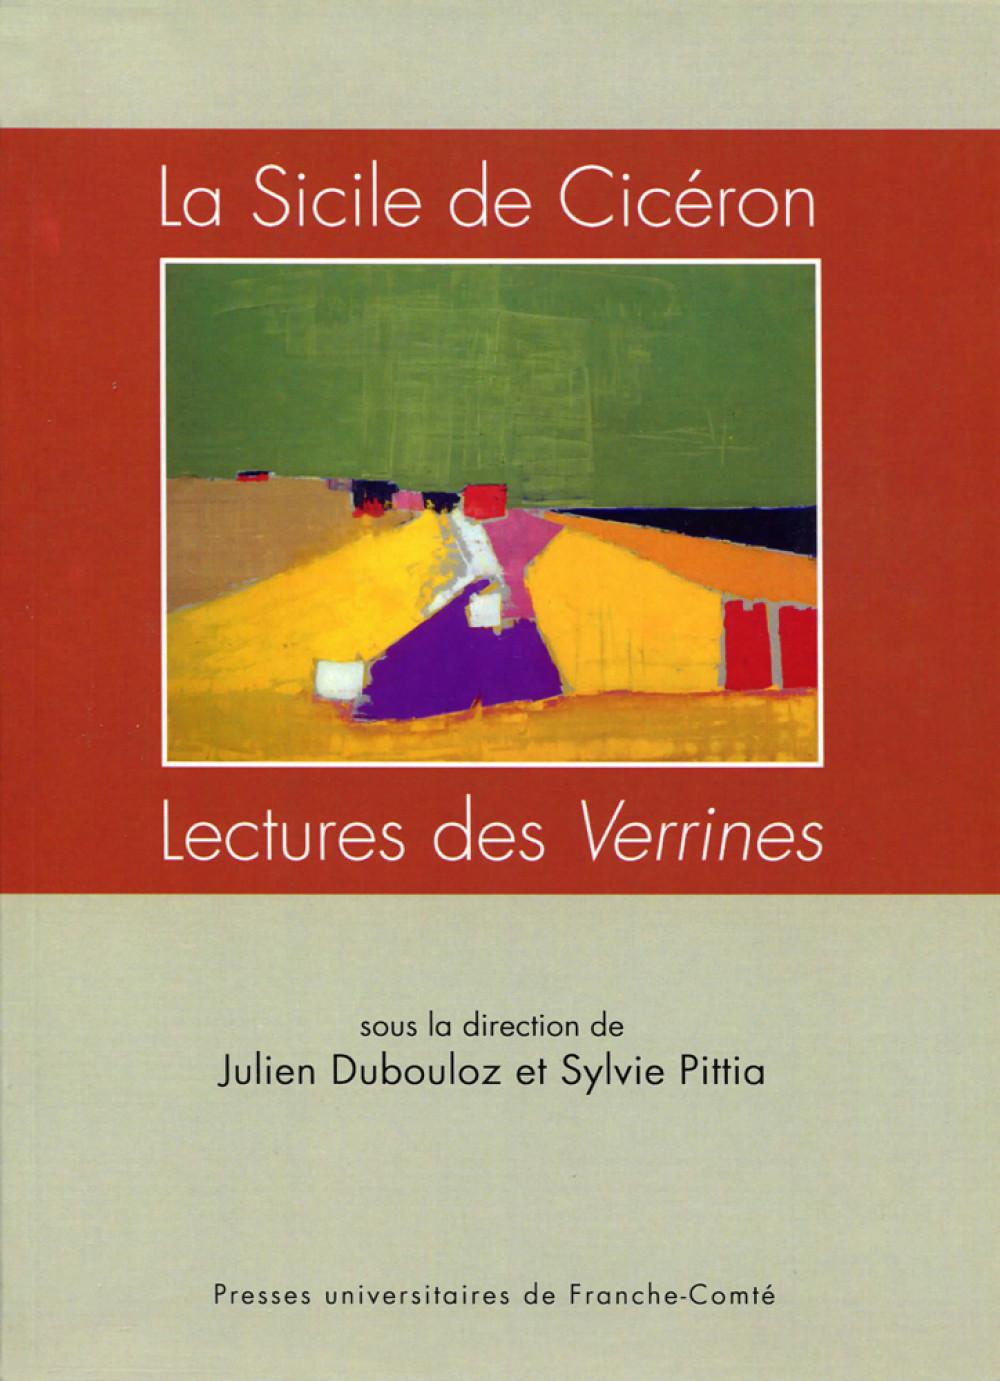 La Sicile de Cicéron